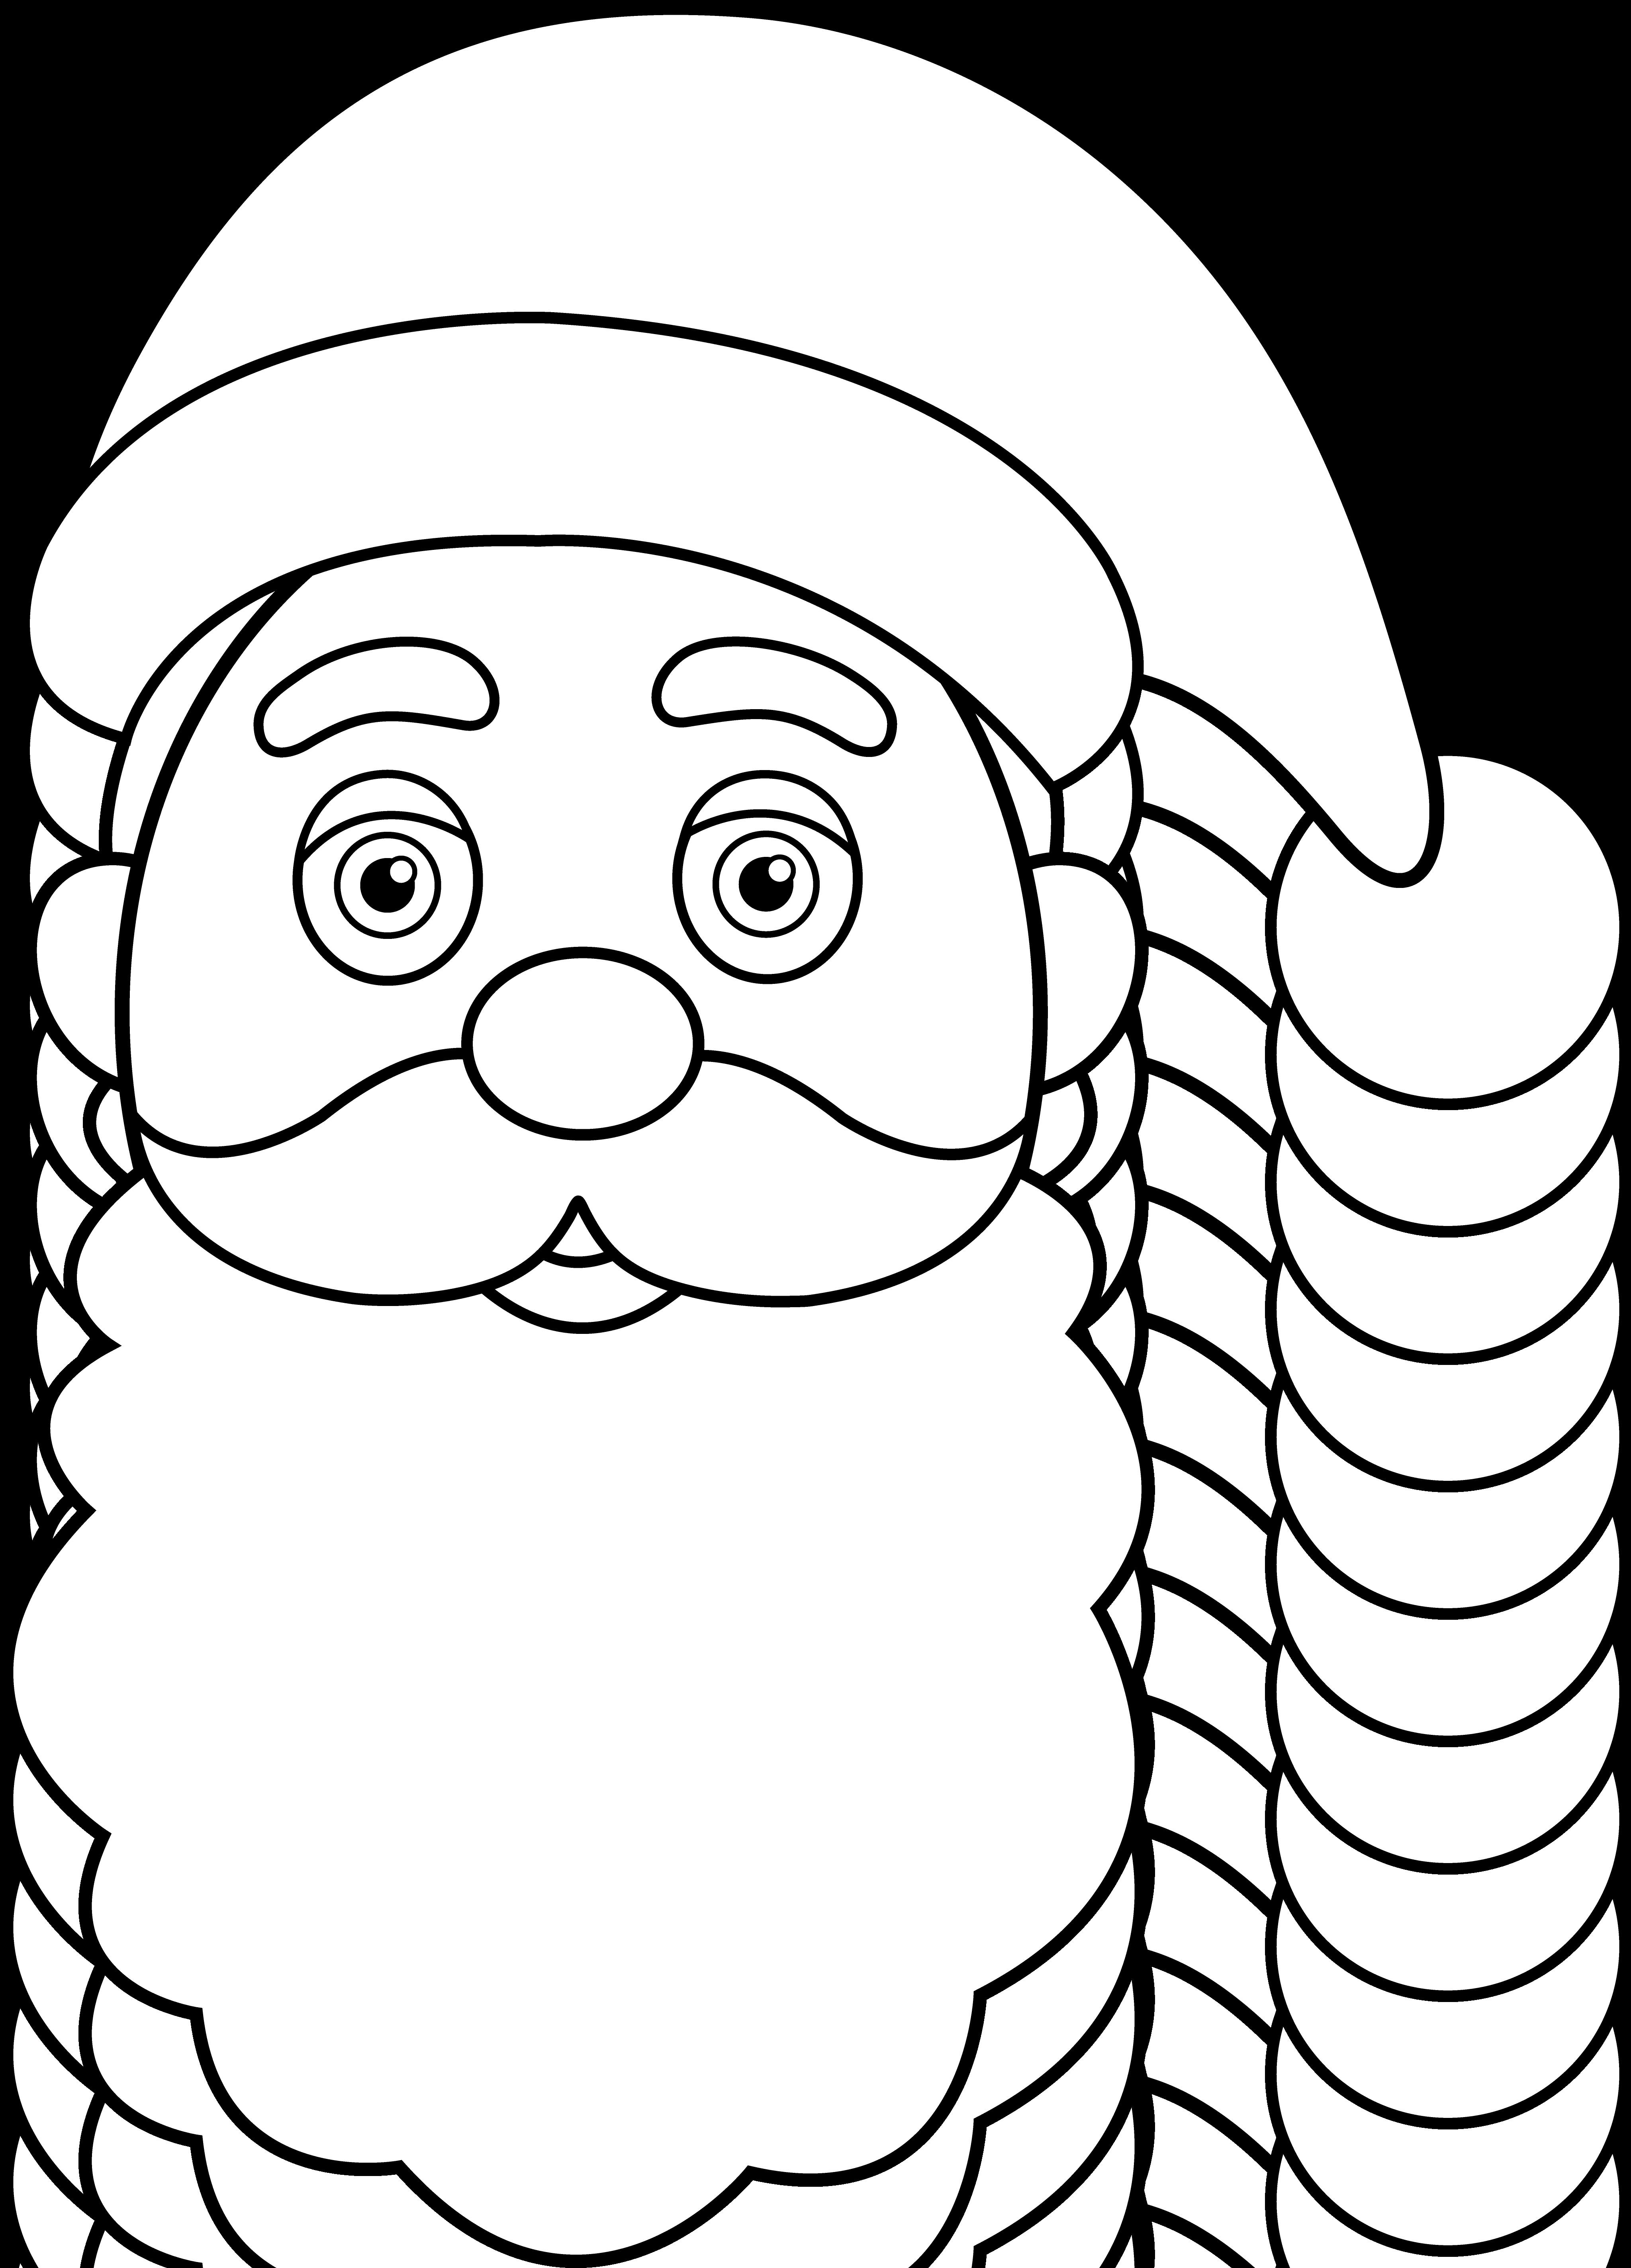 4095x5696 Line Art Of Santa Claus Face